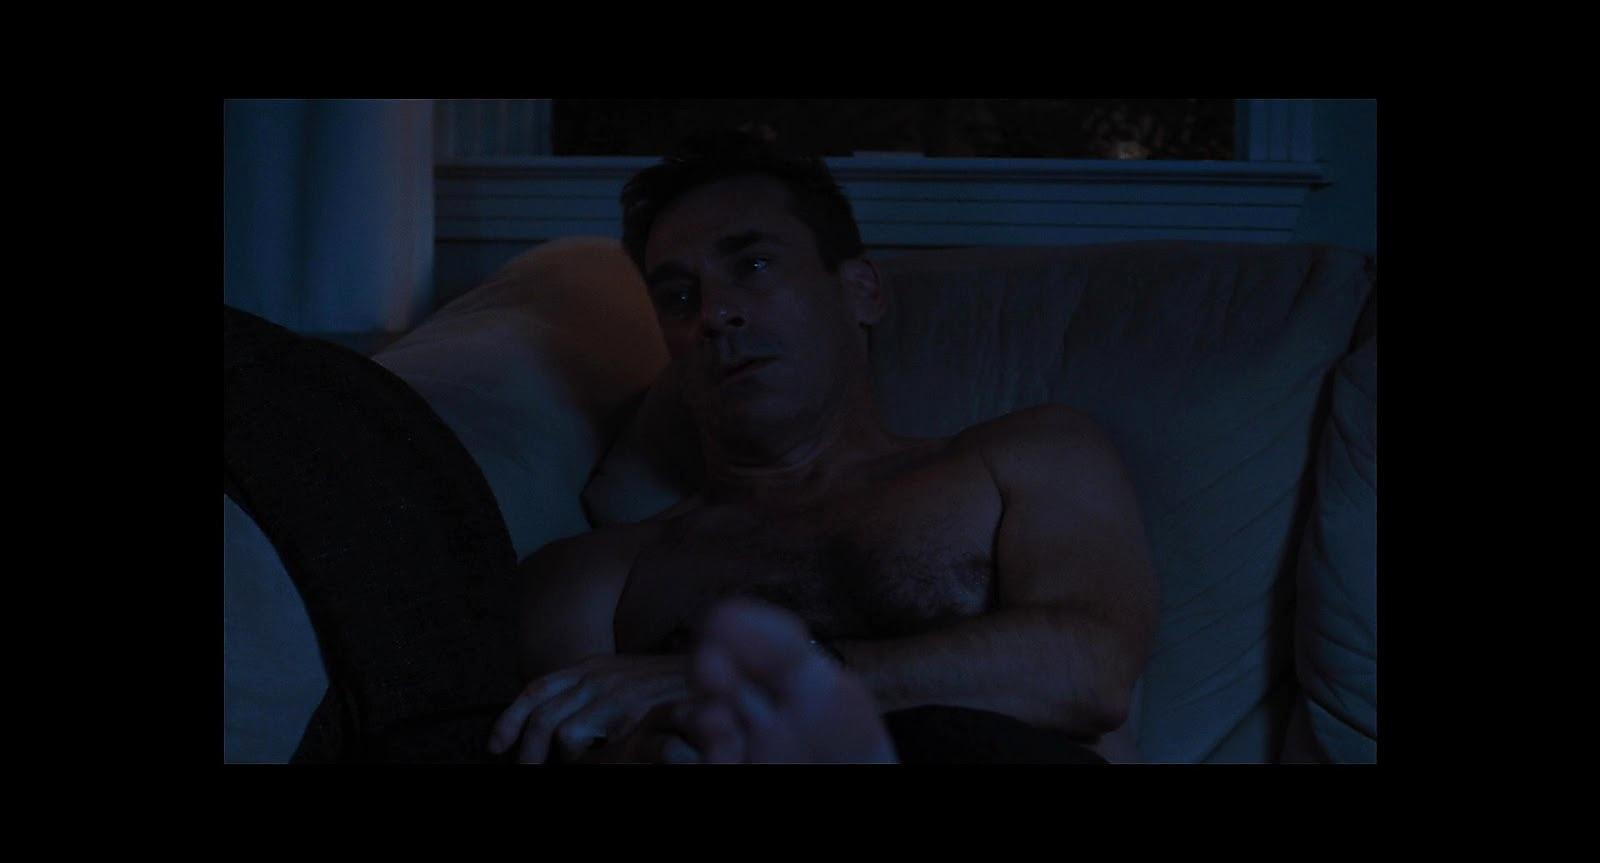 Jon Hamm sexy shirtless scene March 31, 2020, 5am